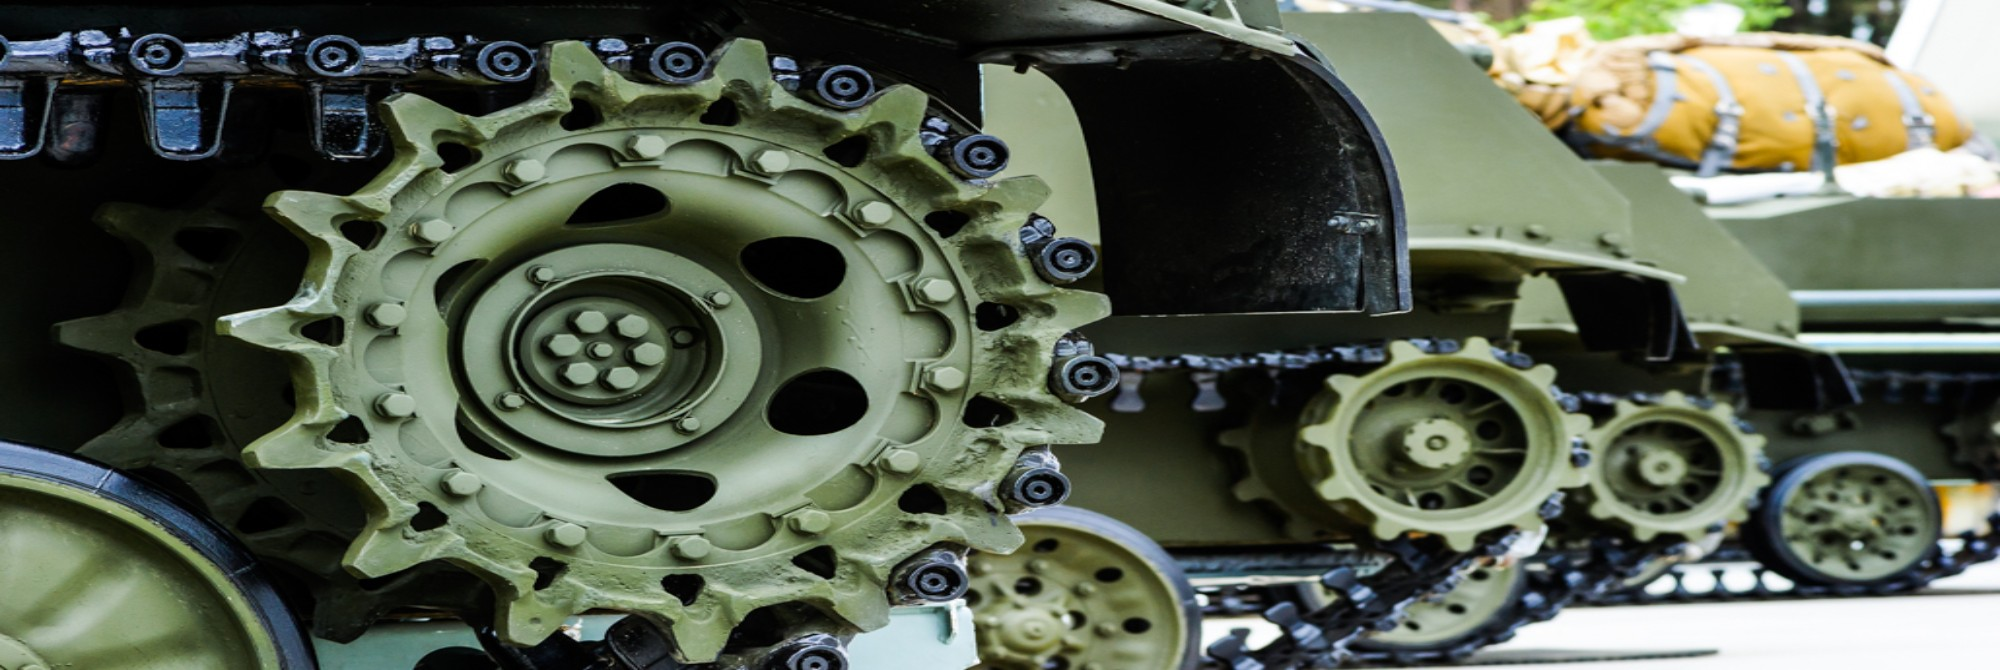 defense industry thyssenkrupp materials na